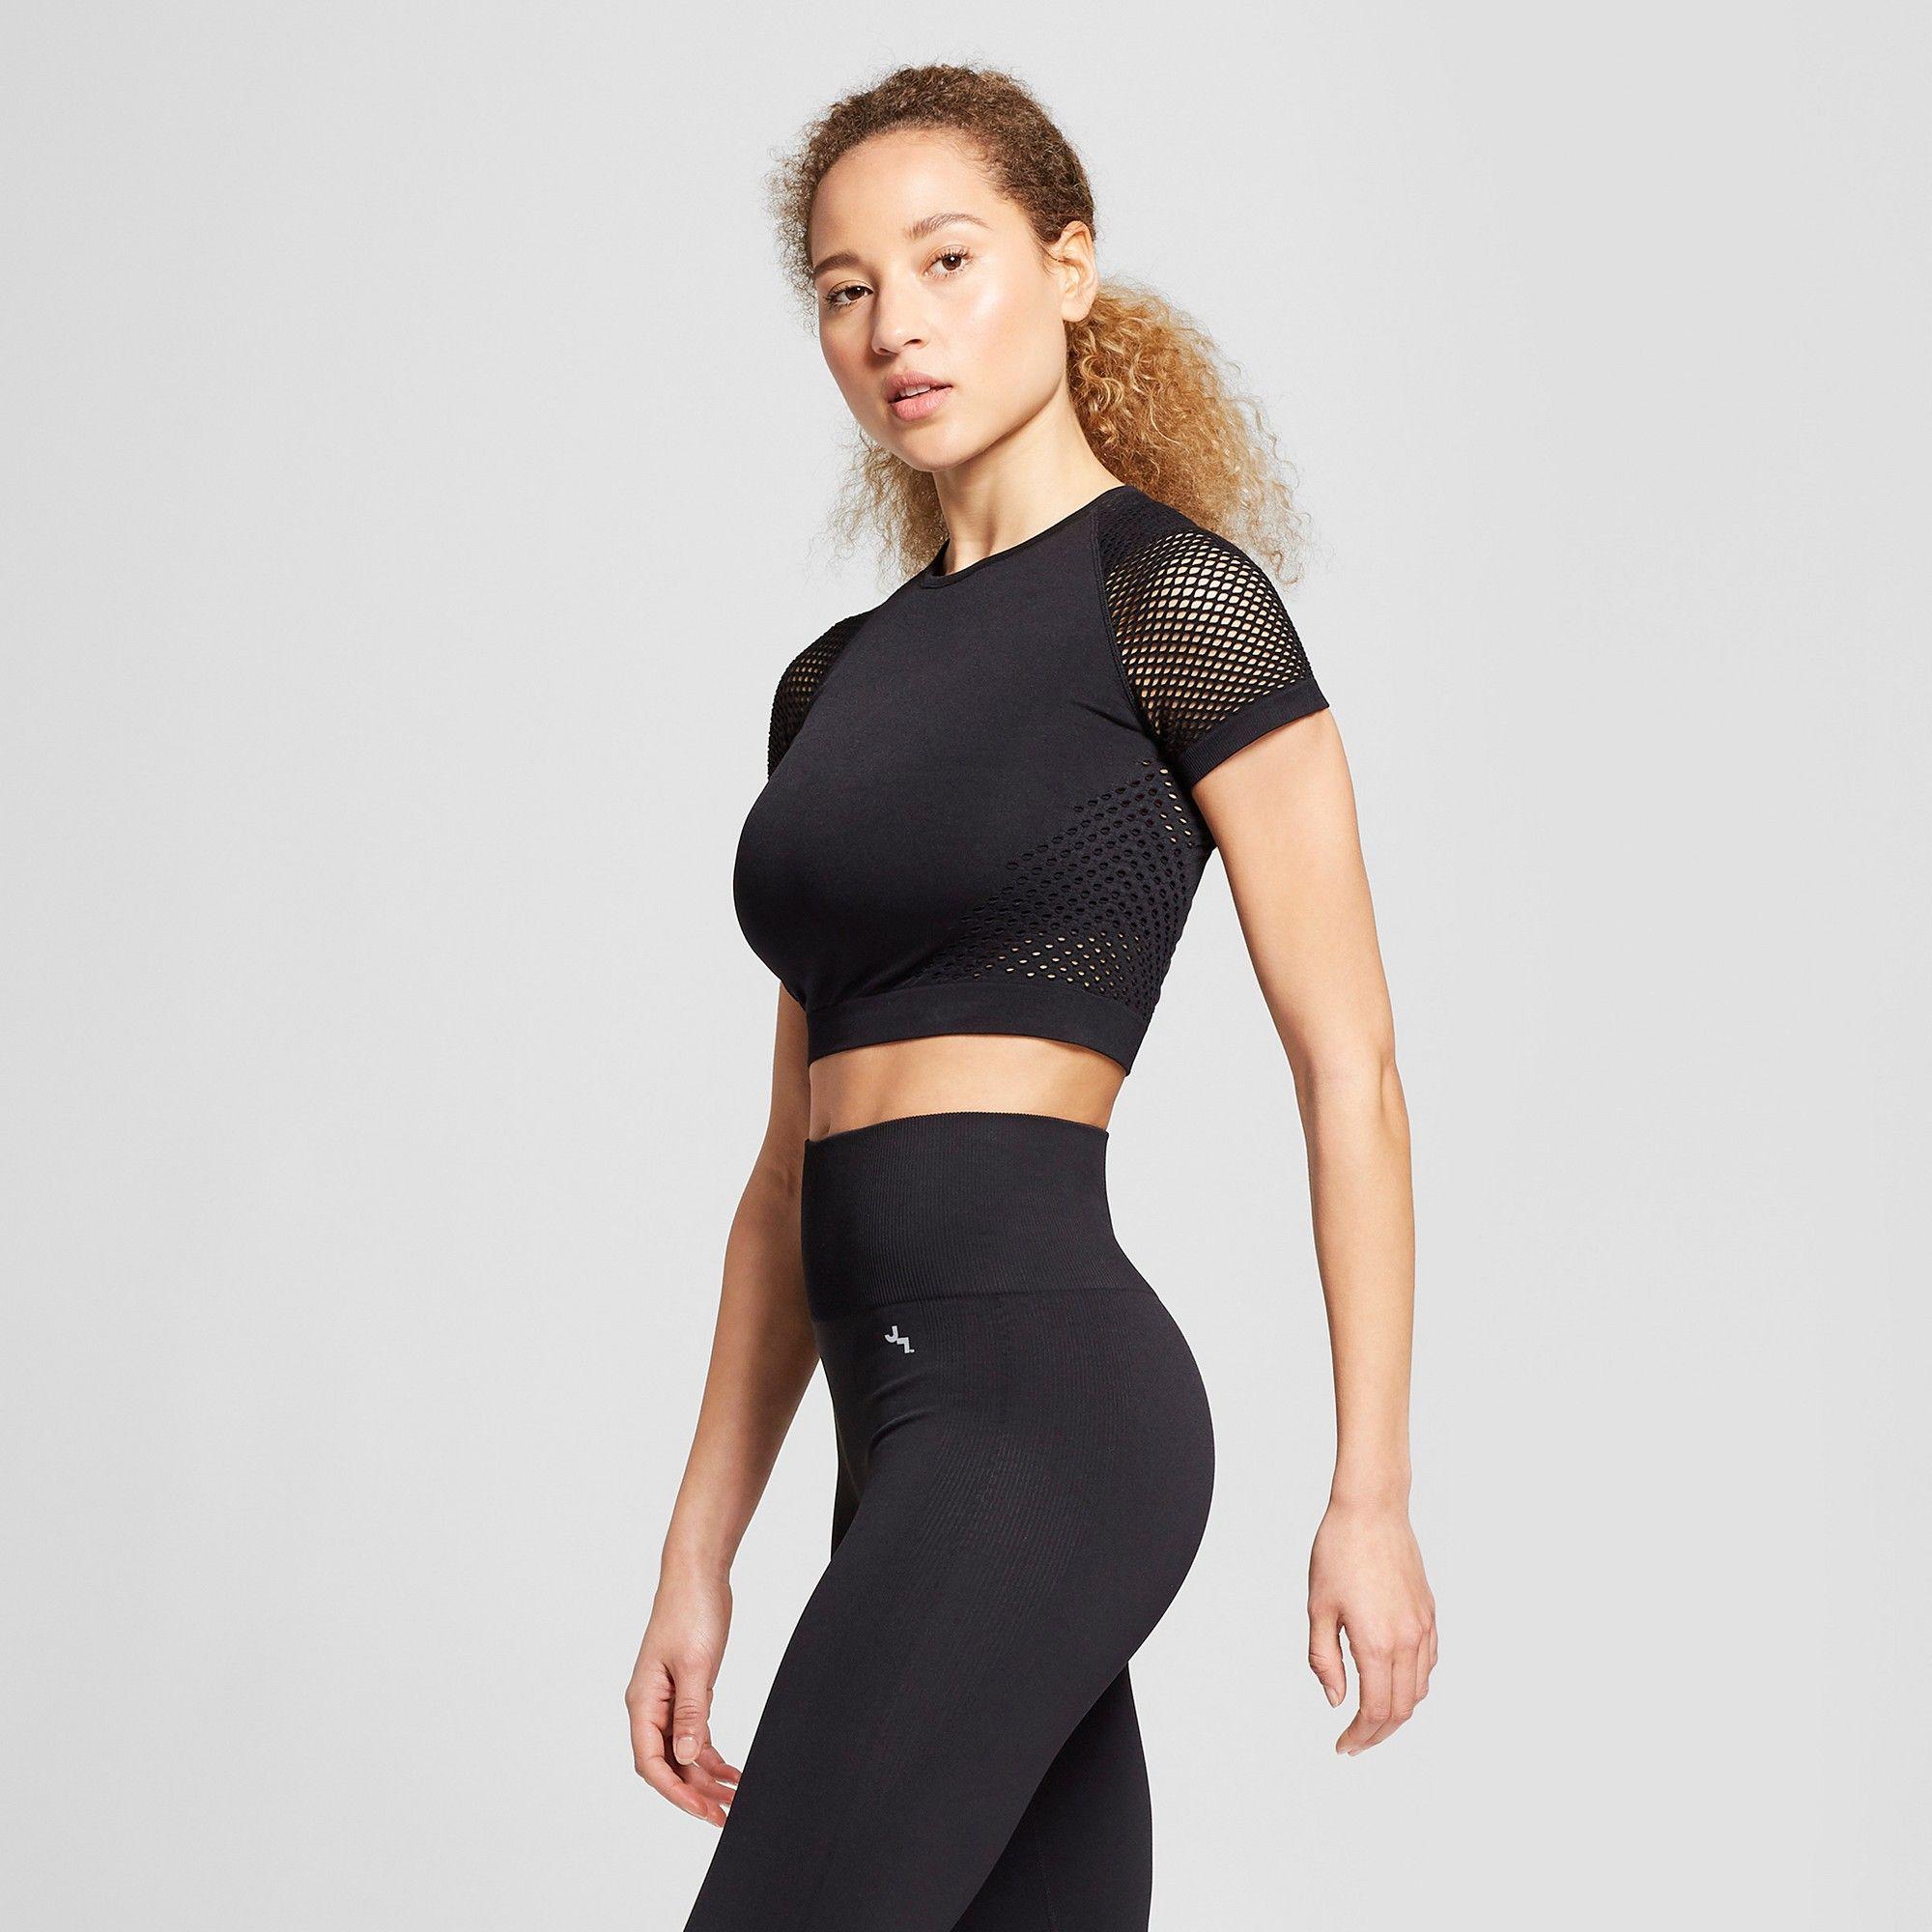 4210a2d99b9 Women s Seamless Short Sleeve Crop Top - JoyLab Black Xxl